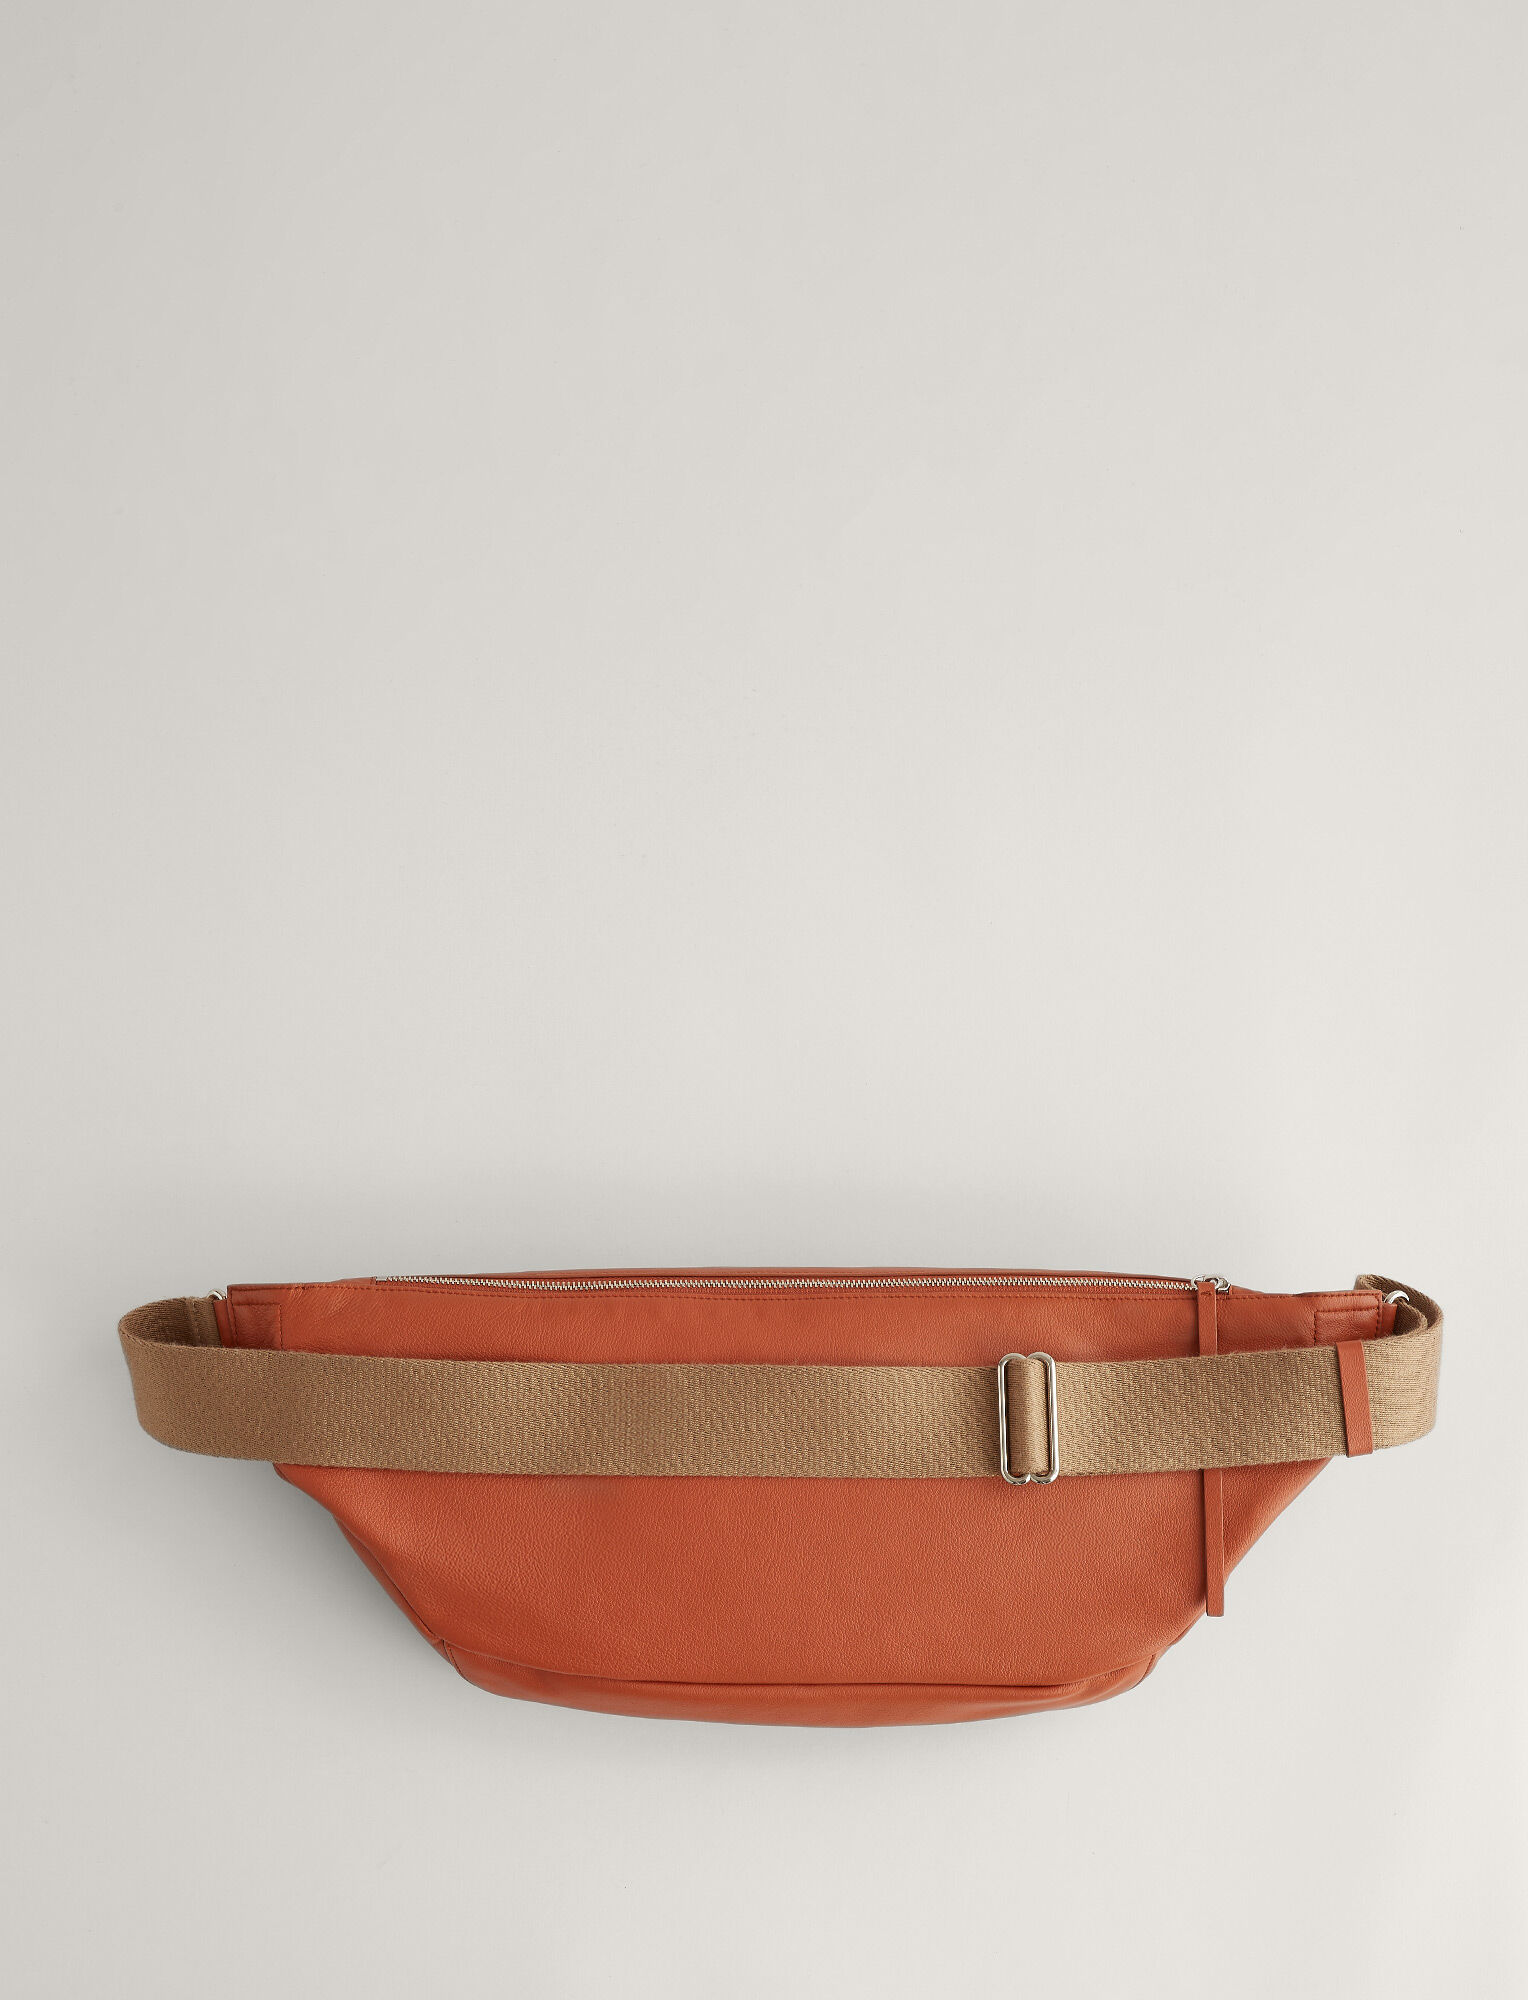 Joseph, Harley Leather Bag, in RUST